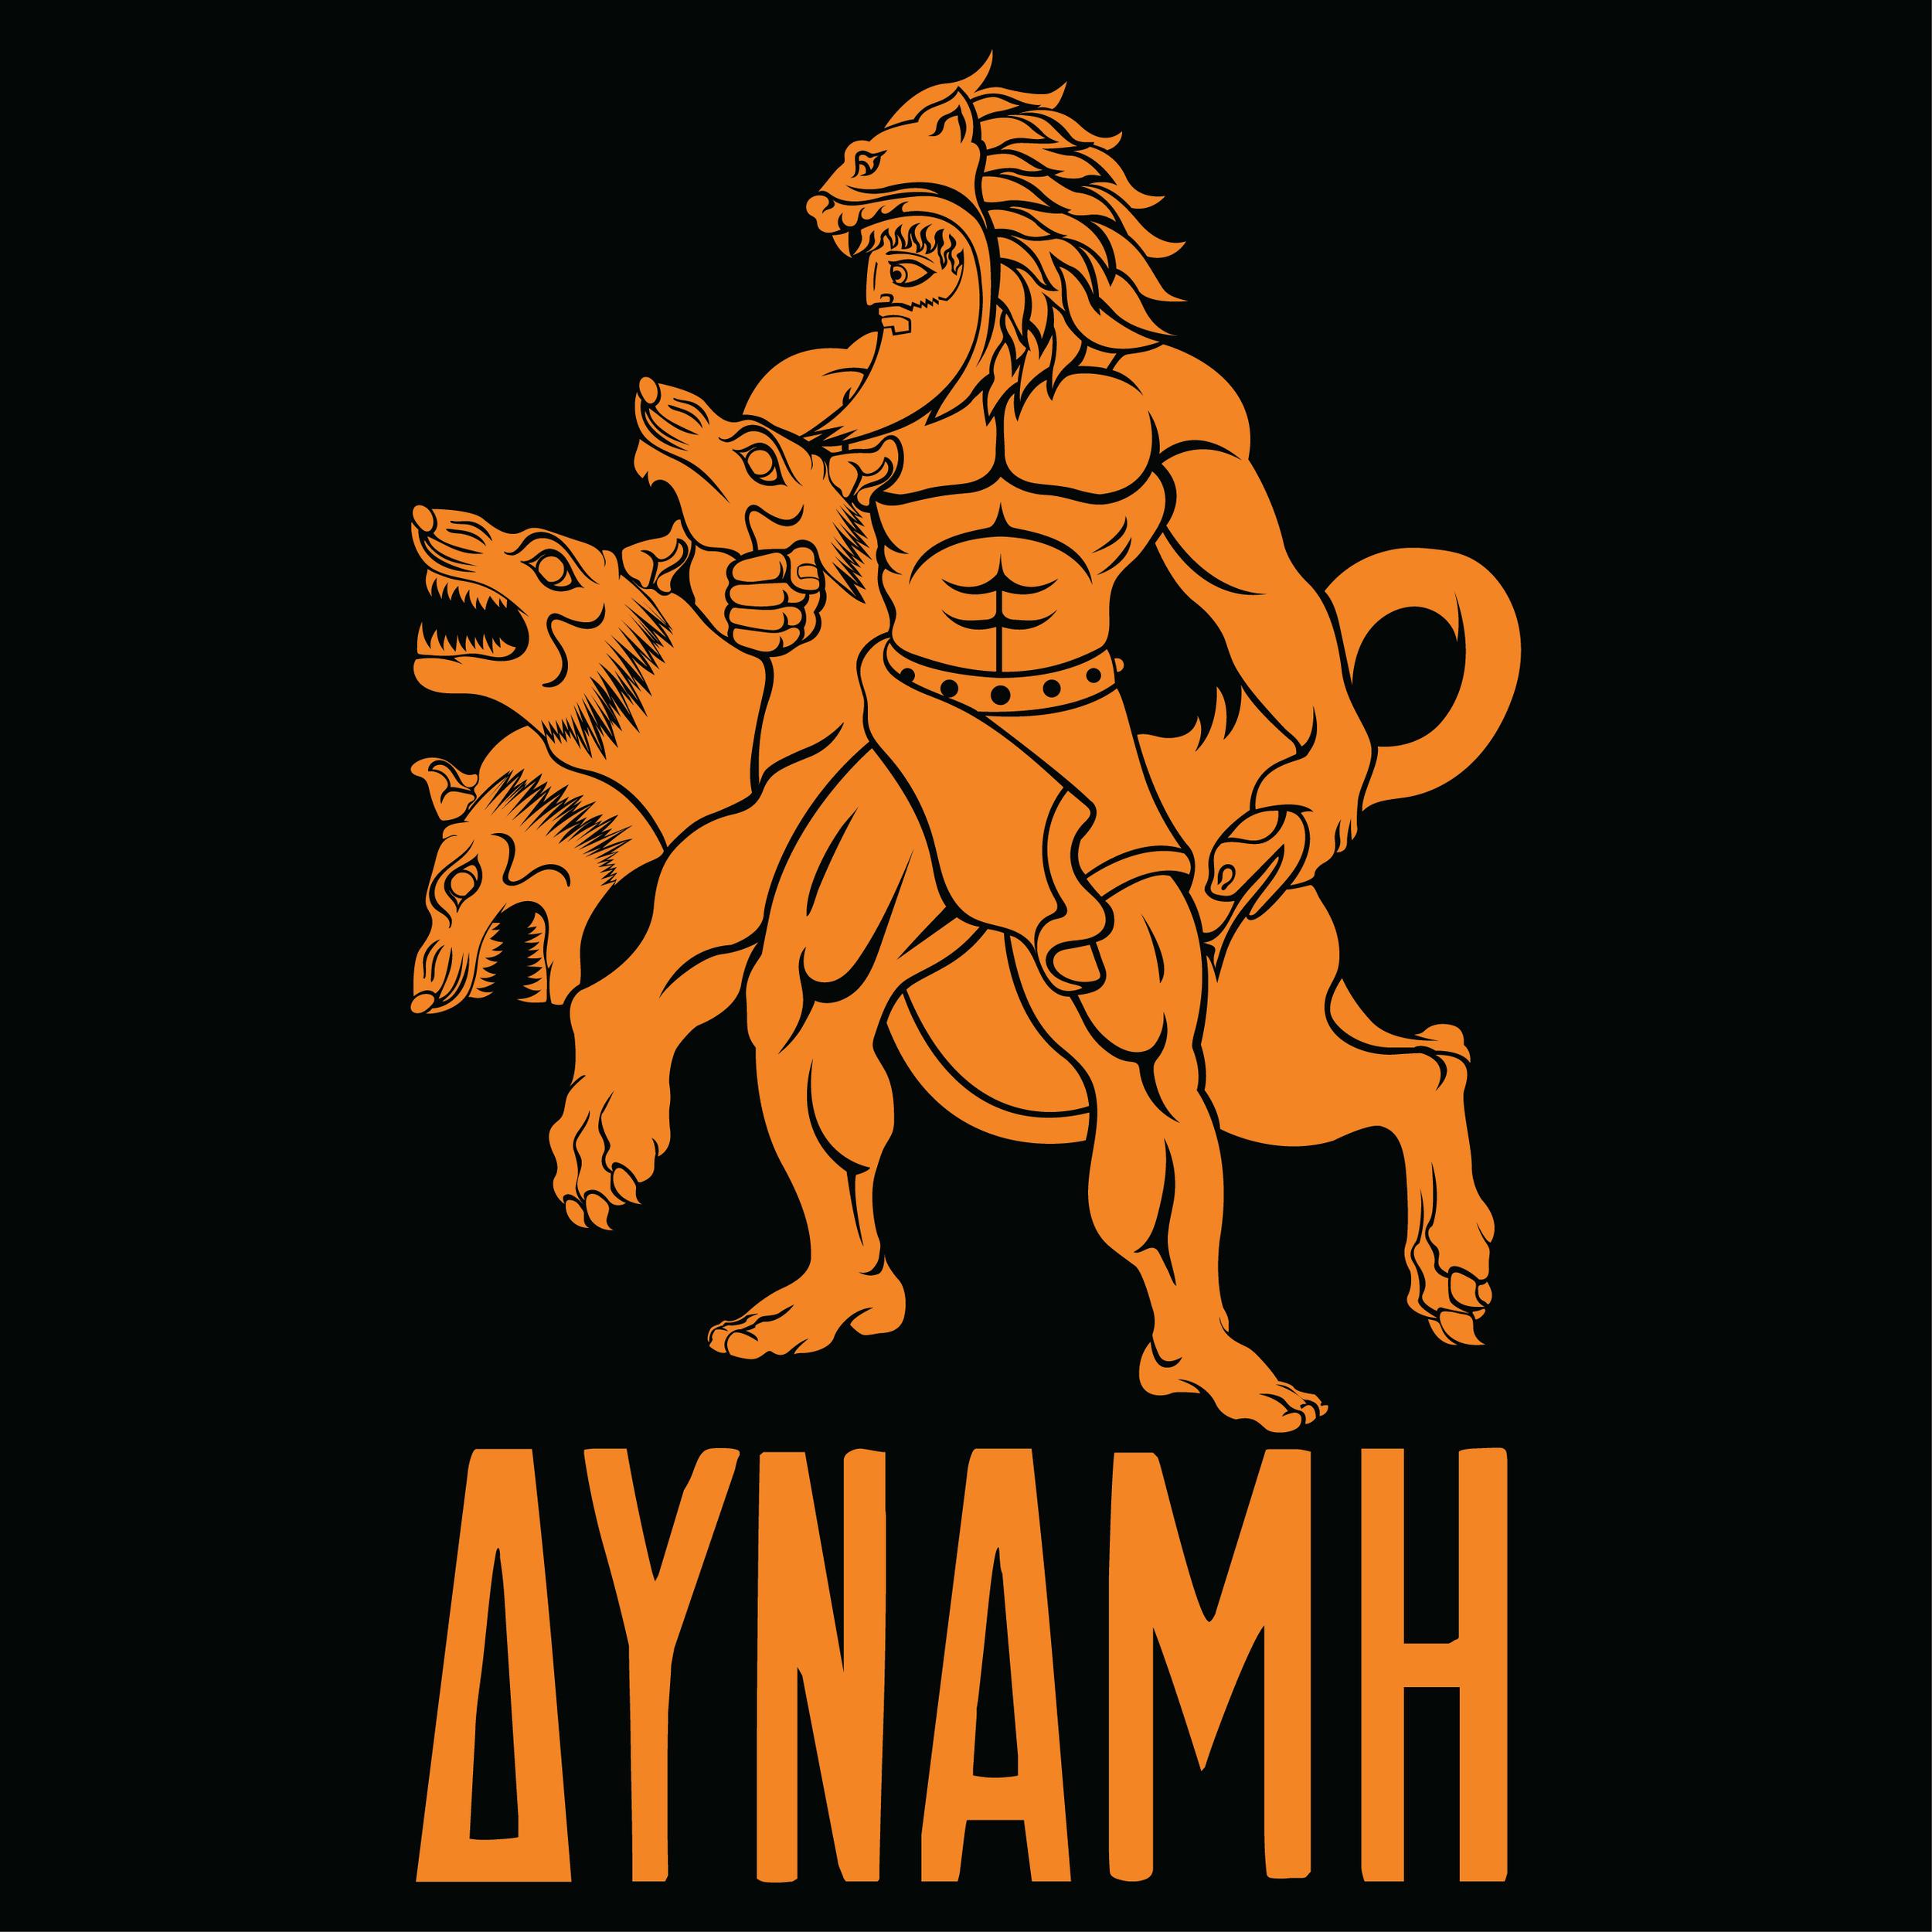 hercules-greek-mythology-mythos-cerberus-beast-12-labors-strength-illustration-adobe-illustrator-raskol-apparel-tshirt-design-roberto-orozco-orozcodesign-art-artist-roberto-artist-black-image